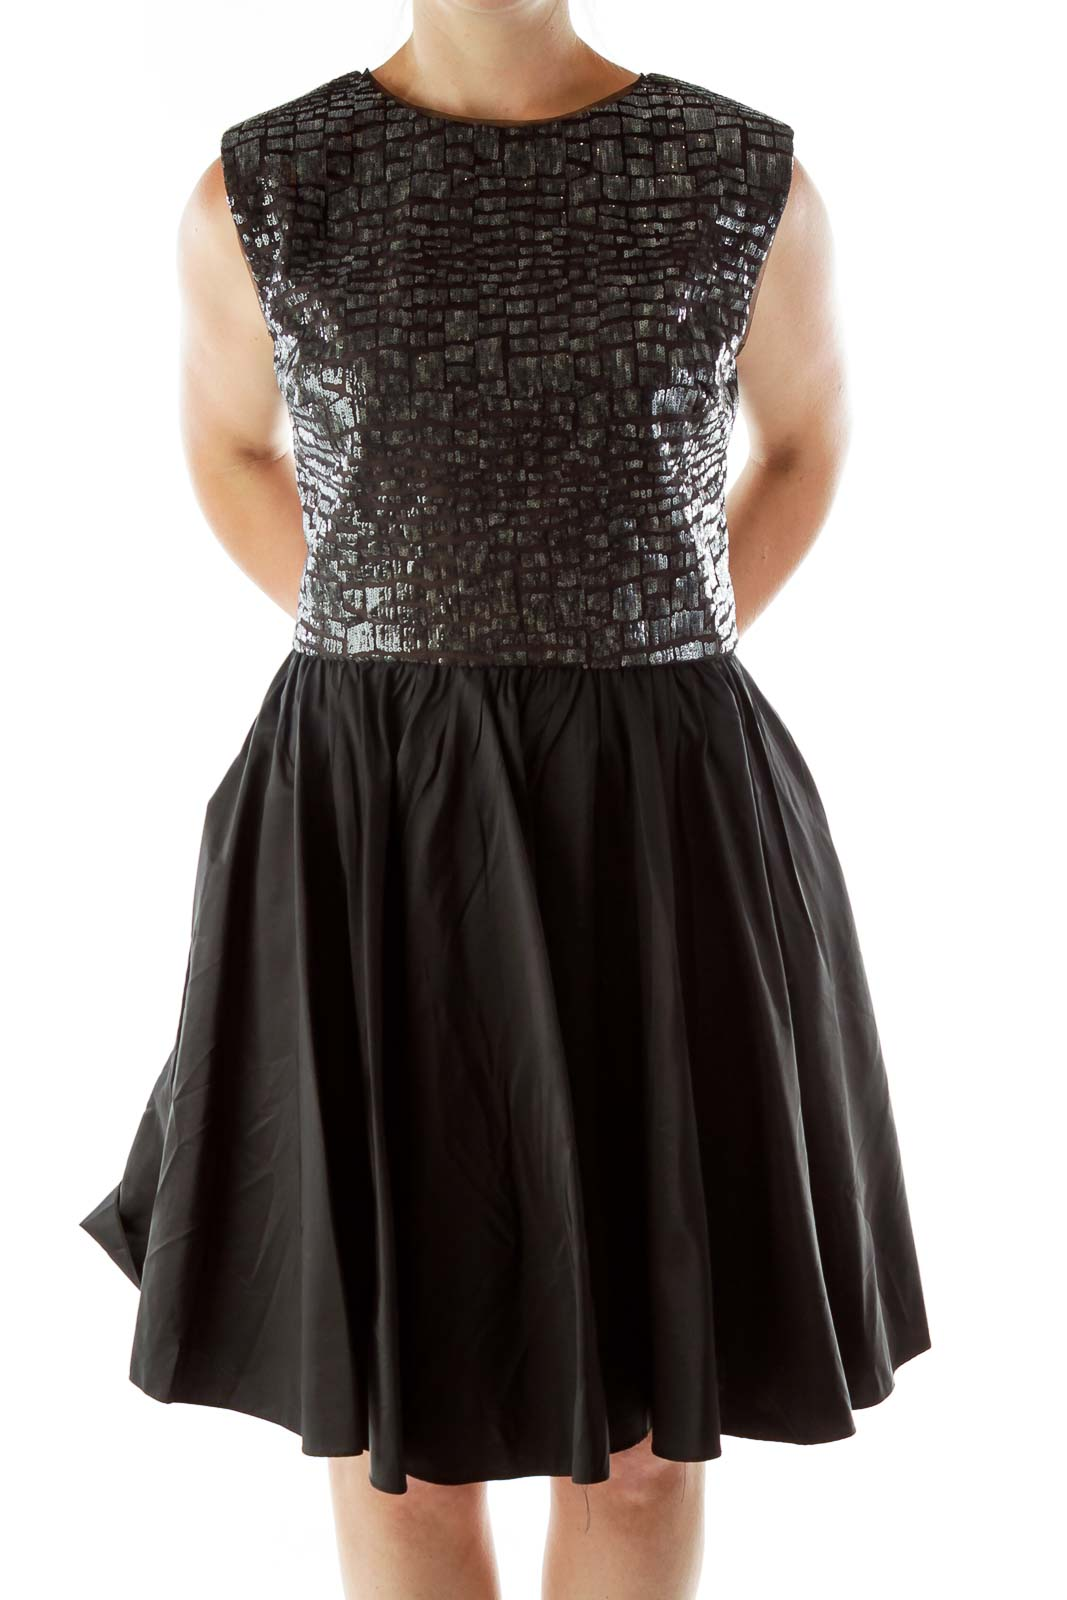 Black Sequined Open Back Evening Dress Front